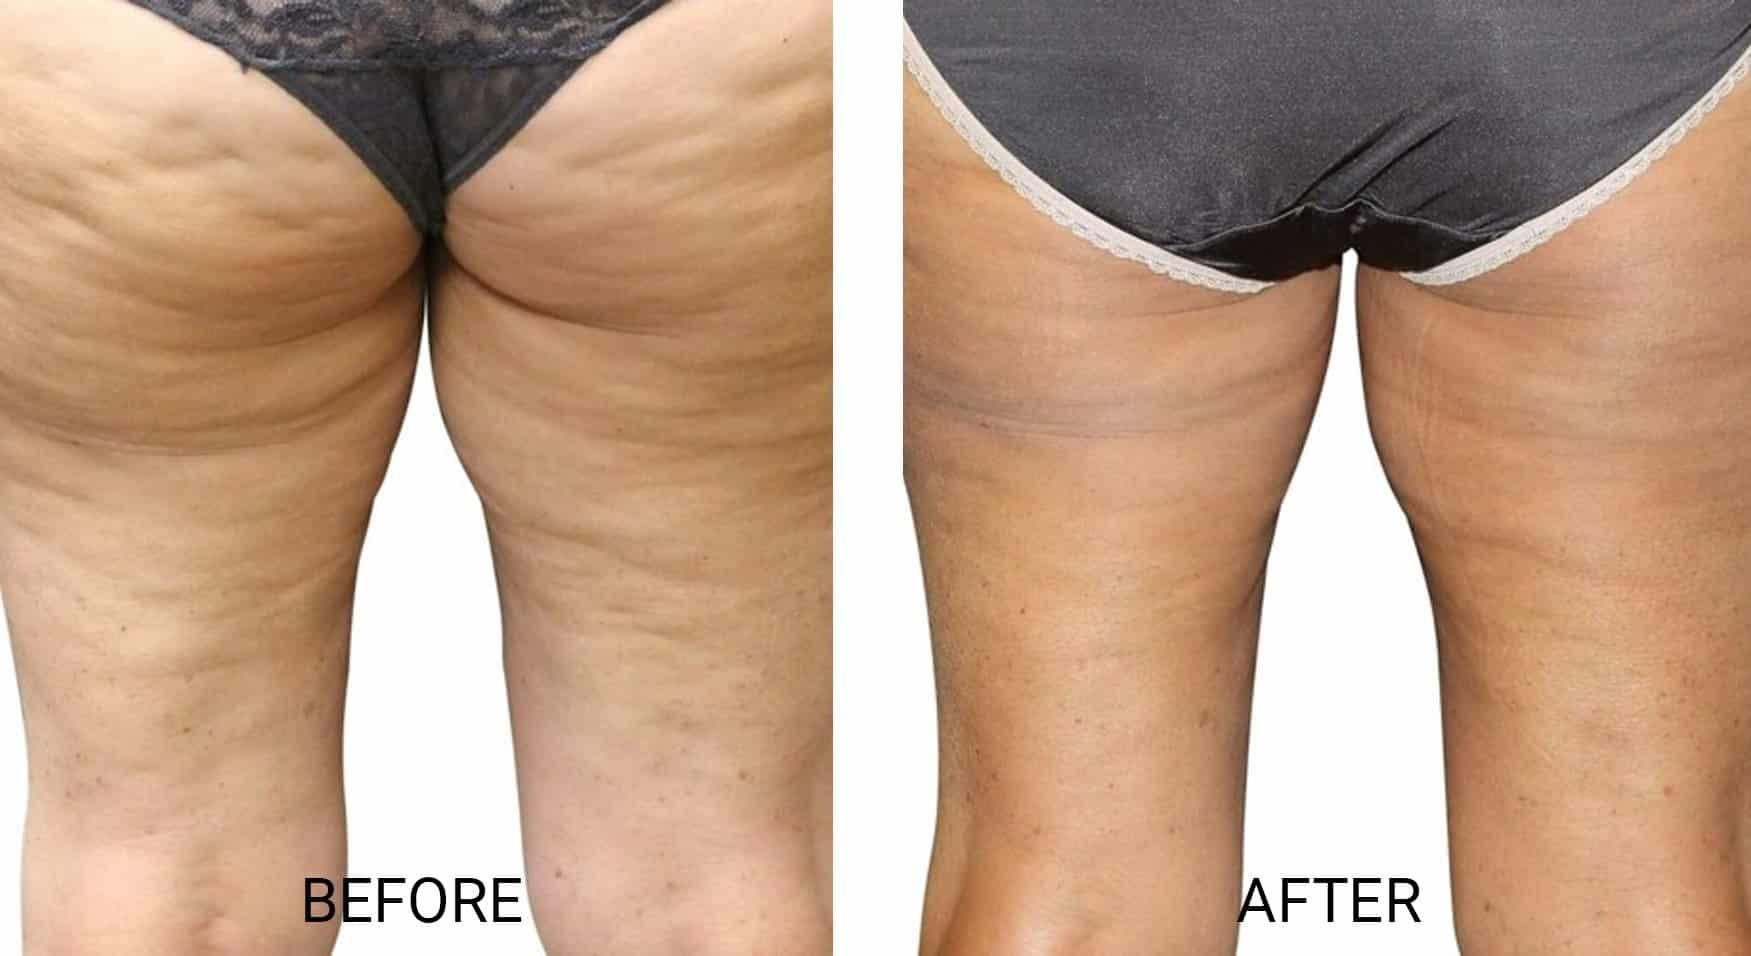 Venus Legacy® for Cellulite on Legs